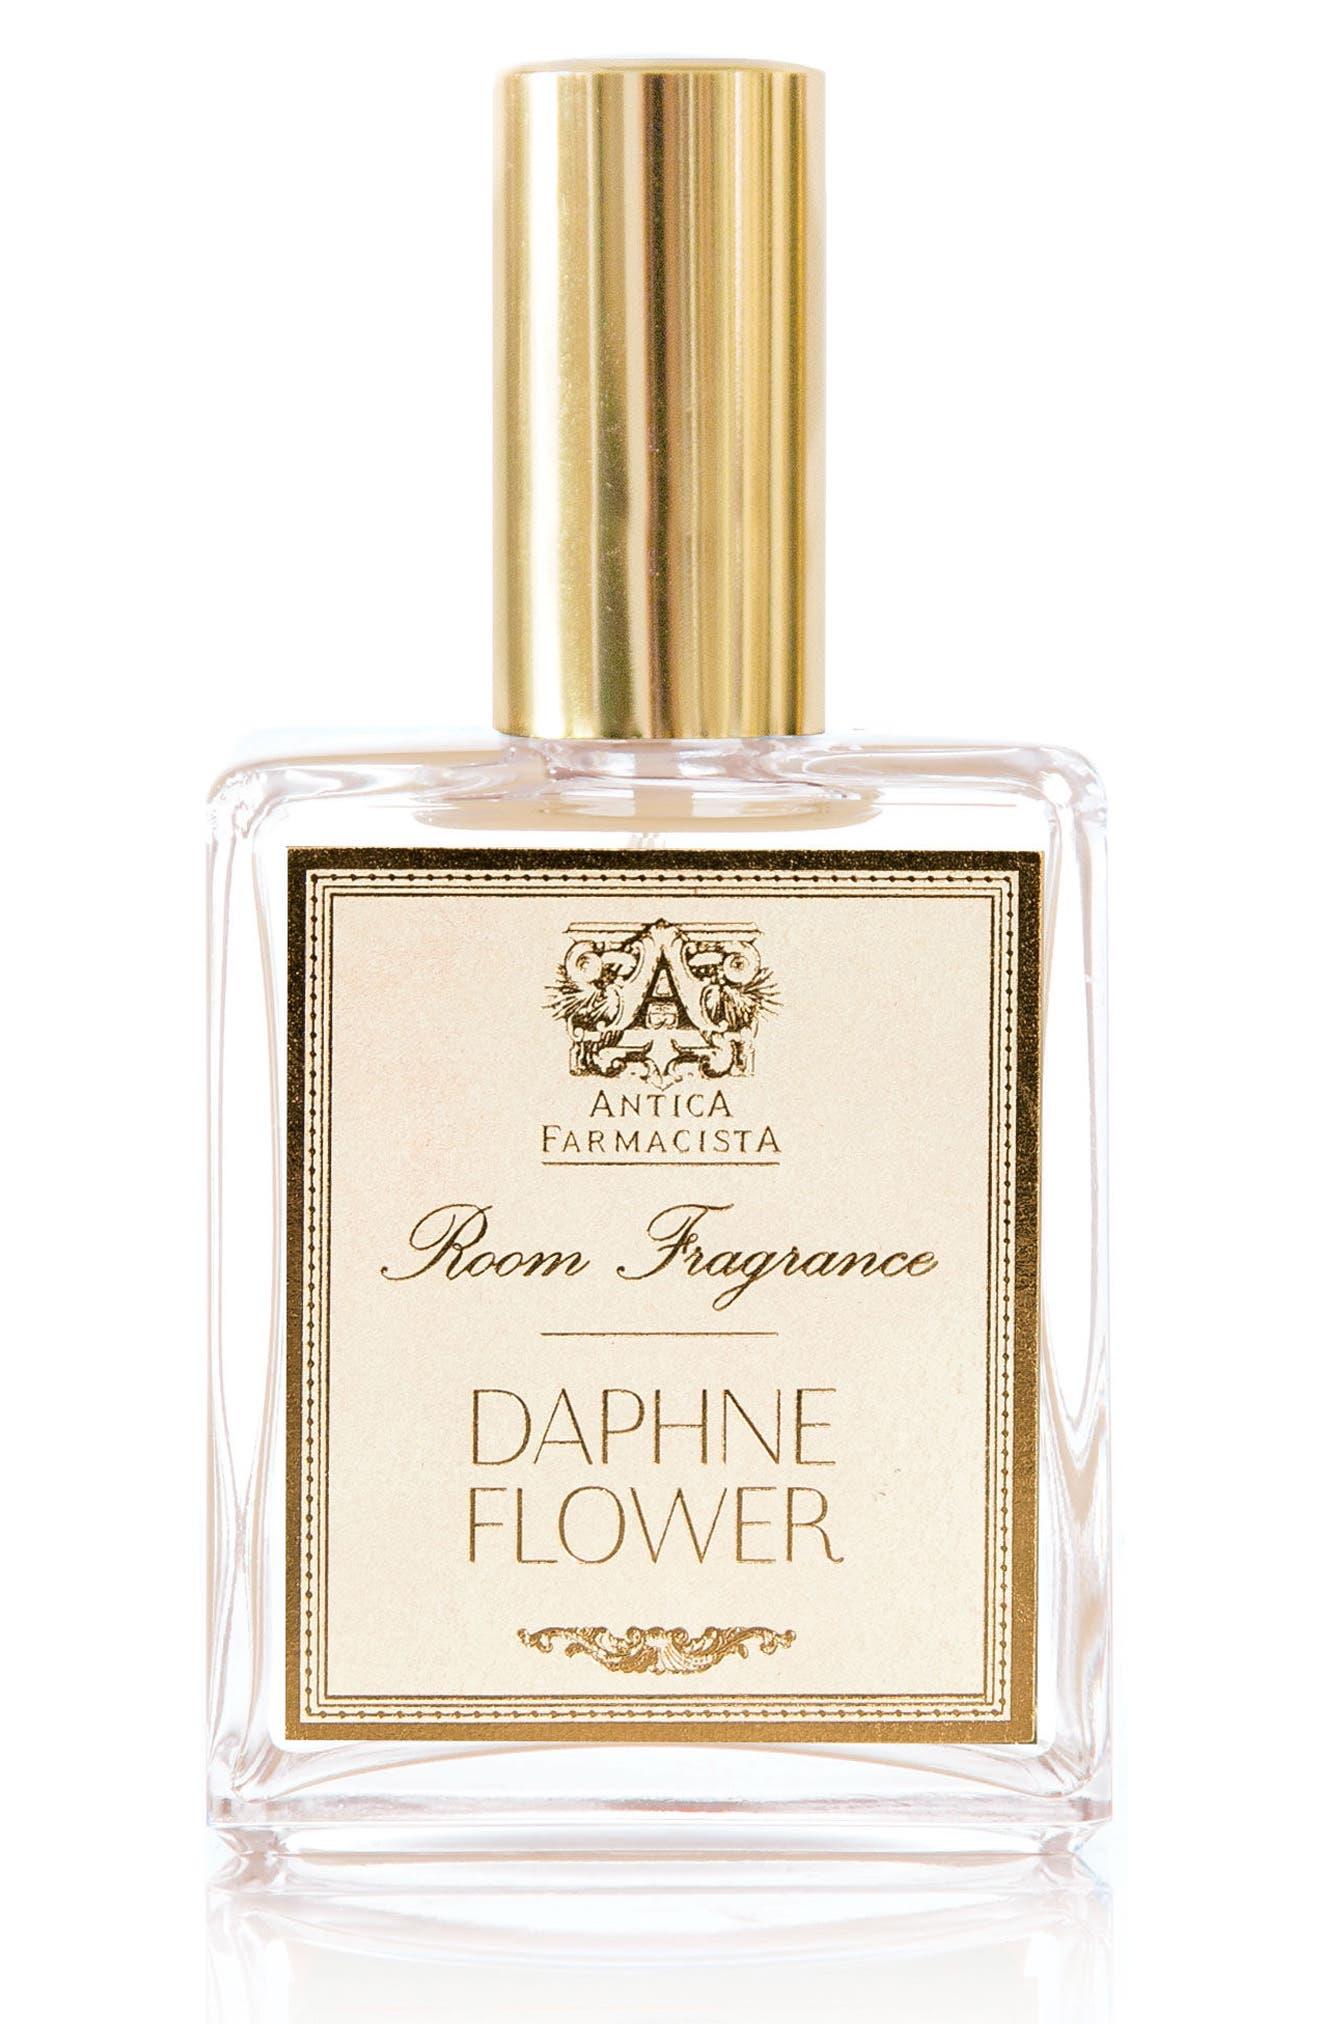 Antica Farmacista Daphne Flower Room & Linen Spray